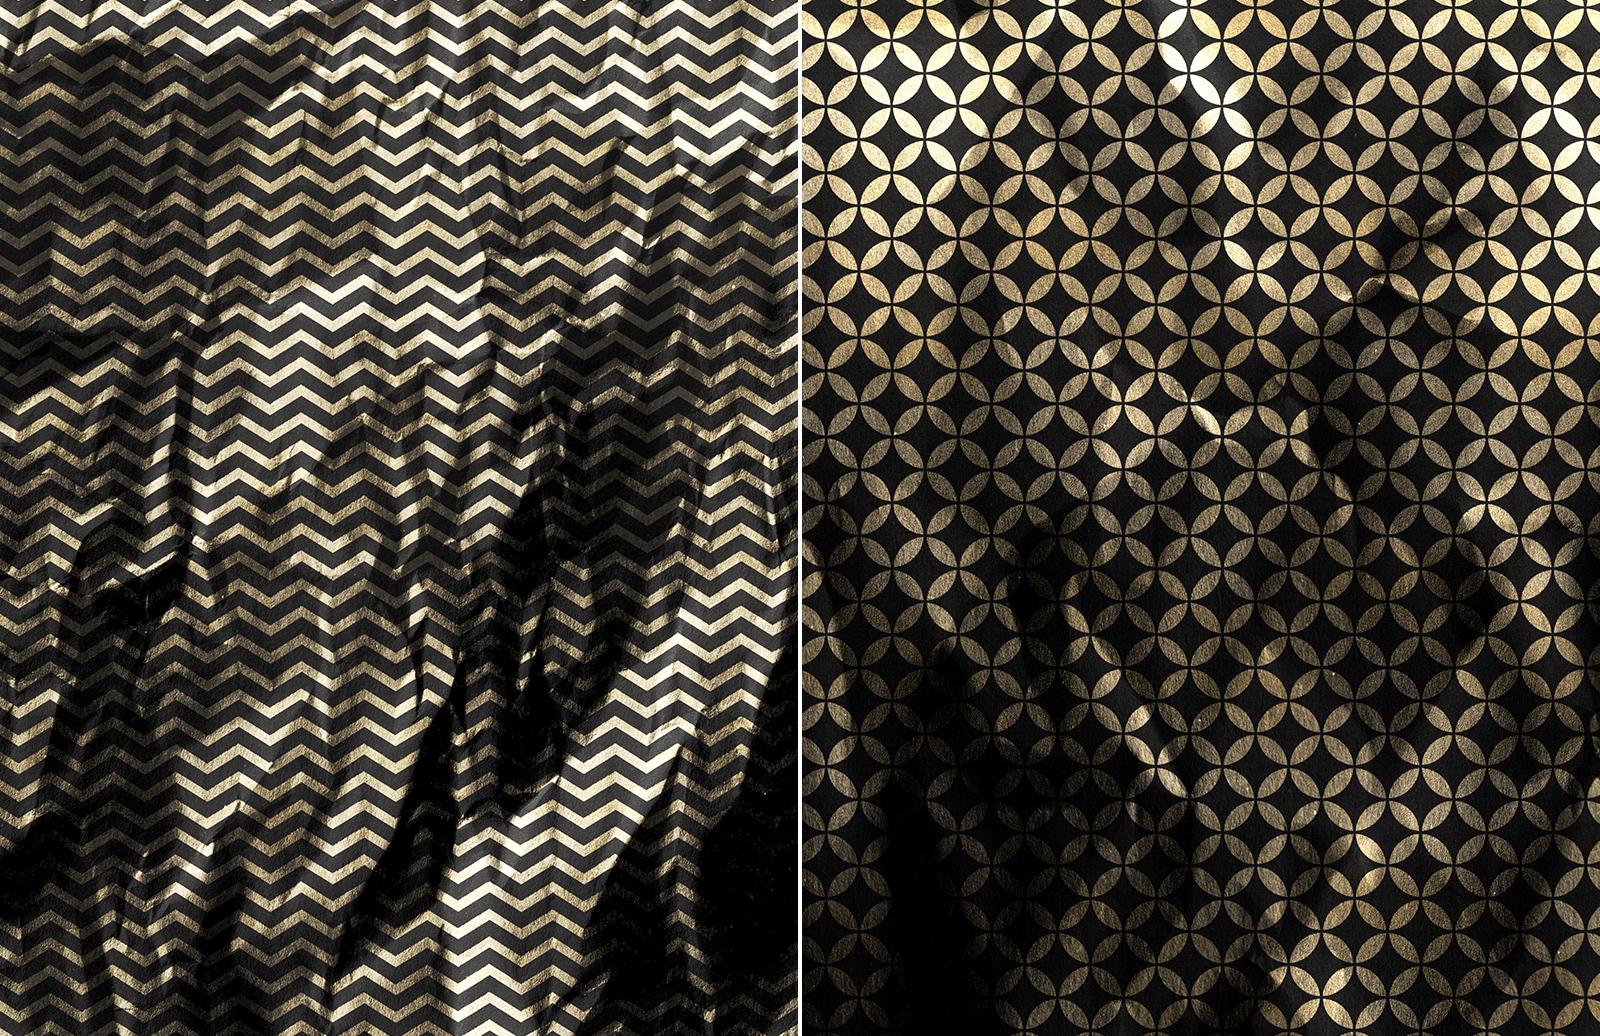 Large Gold  Foil  Paper  Textures  Preview 3